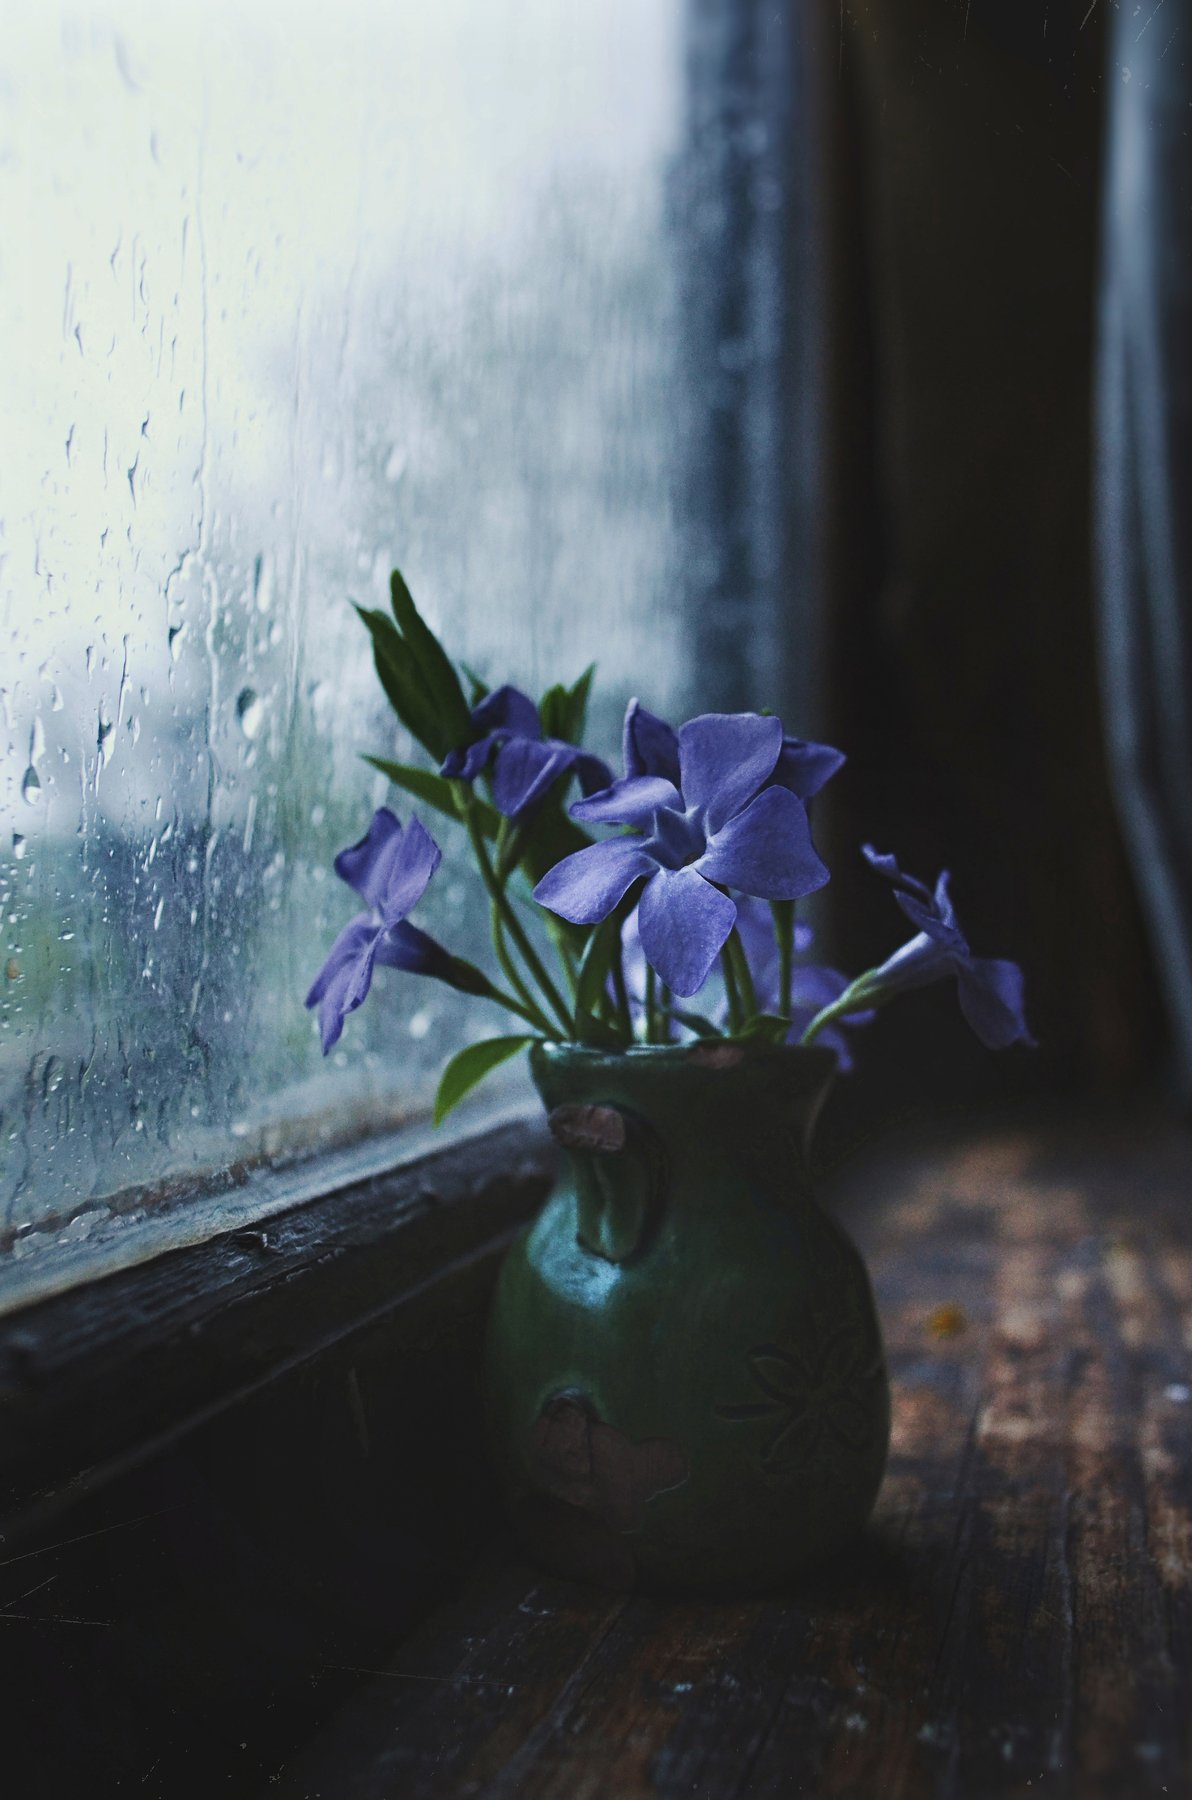 цветы, окно, натюрморт, весна, дождь, вечер, анна салтыкова, ваза, деревня, сумерки, капли, Анна Сергеевна Салтыкова (Анка)